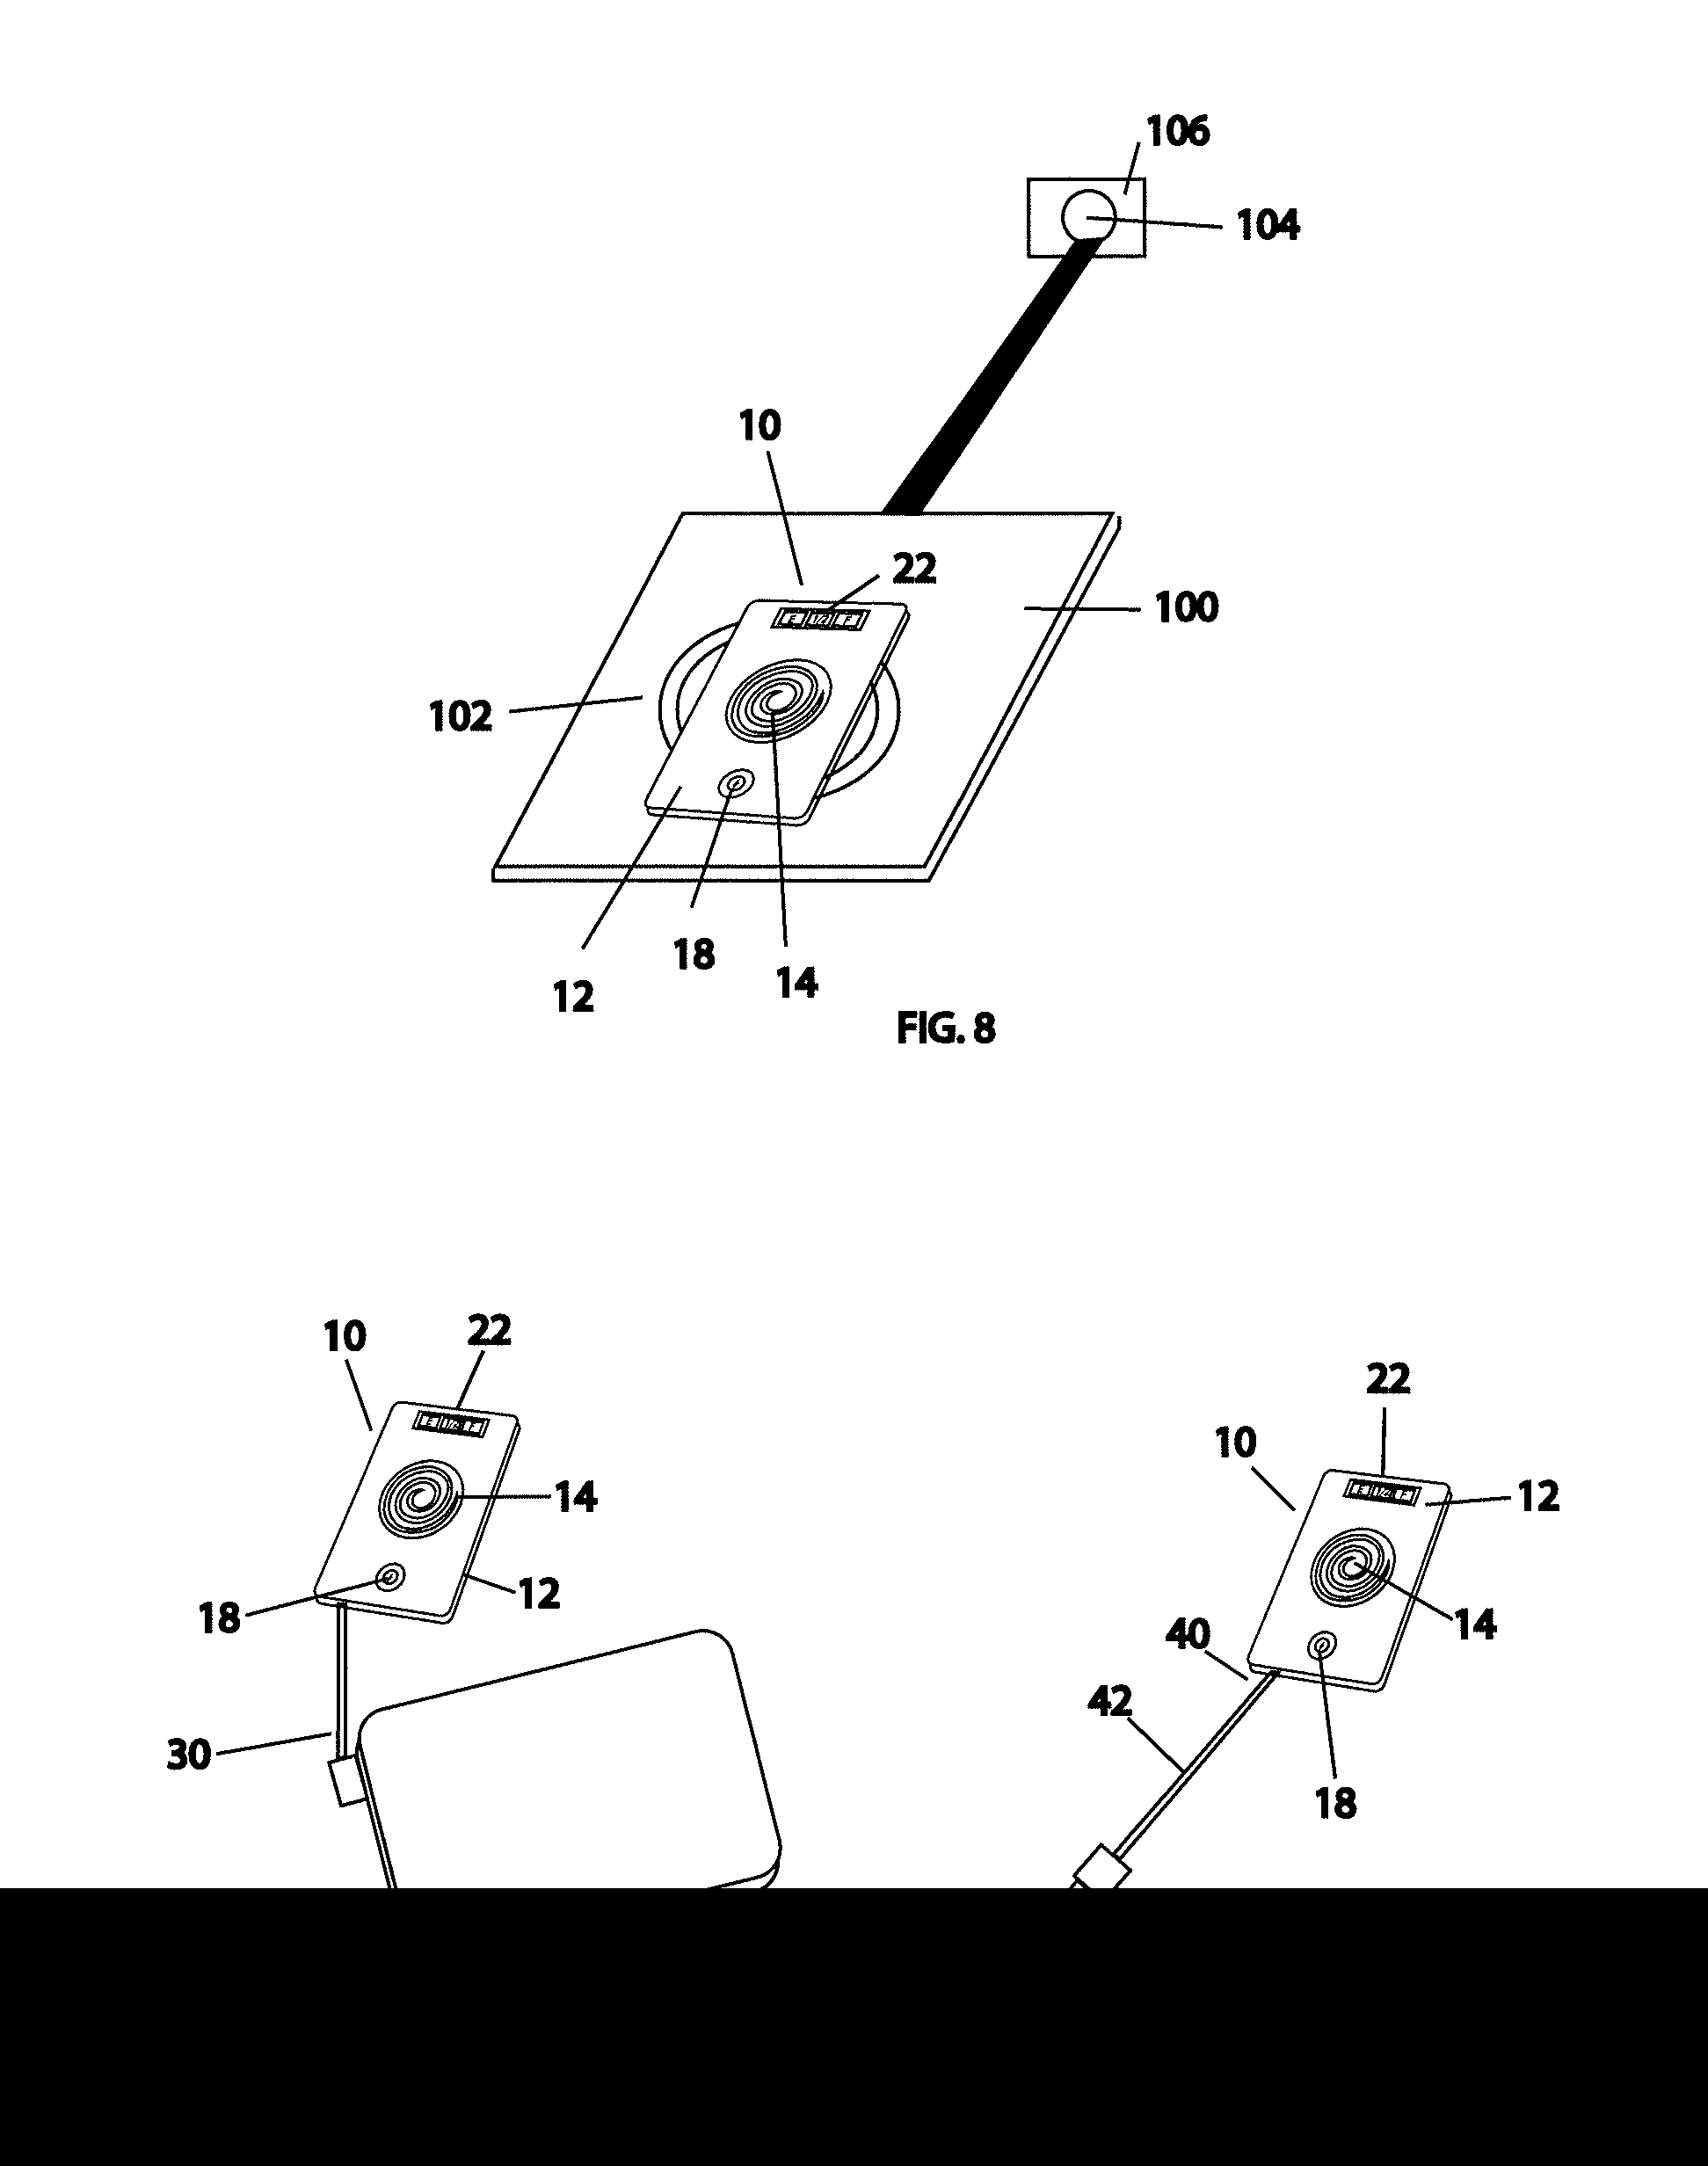 US20150015180A1 20150115 D00004 apple wiring diagram,wiring wiring diagram images database,Apple Wall Plug Wiring Diagram